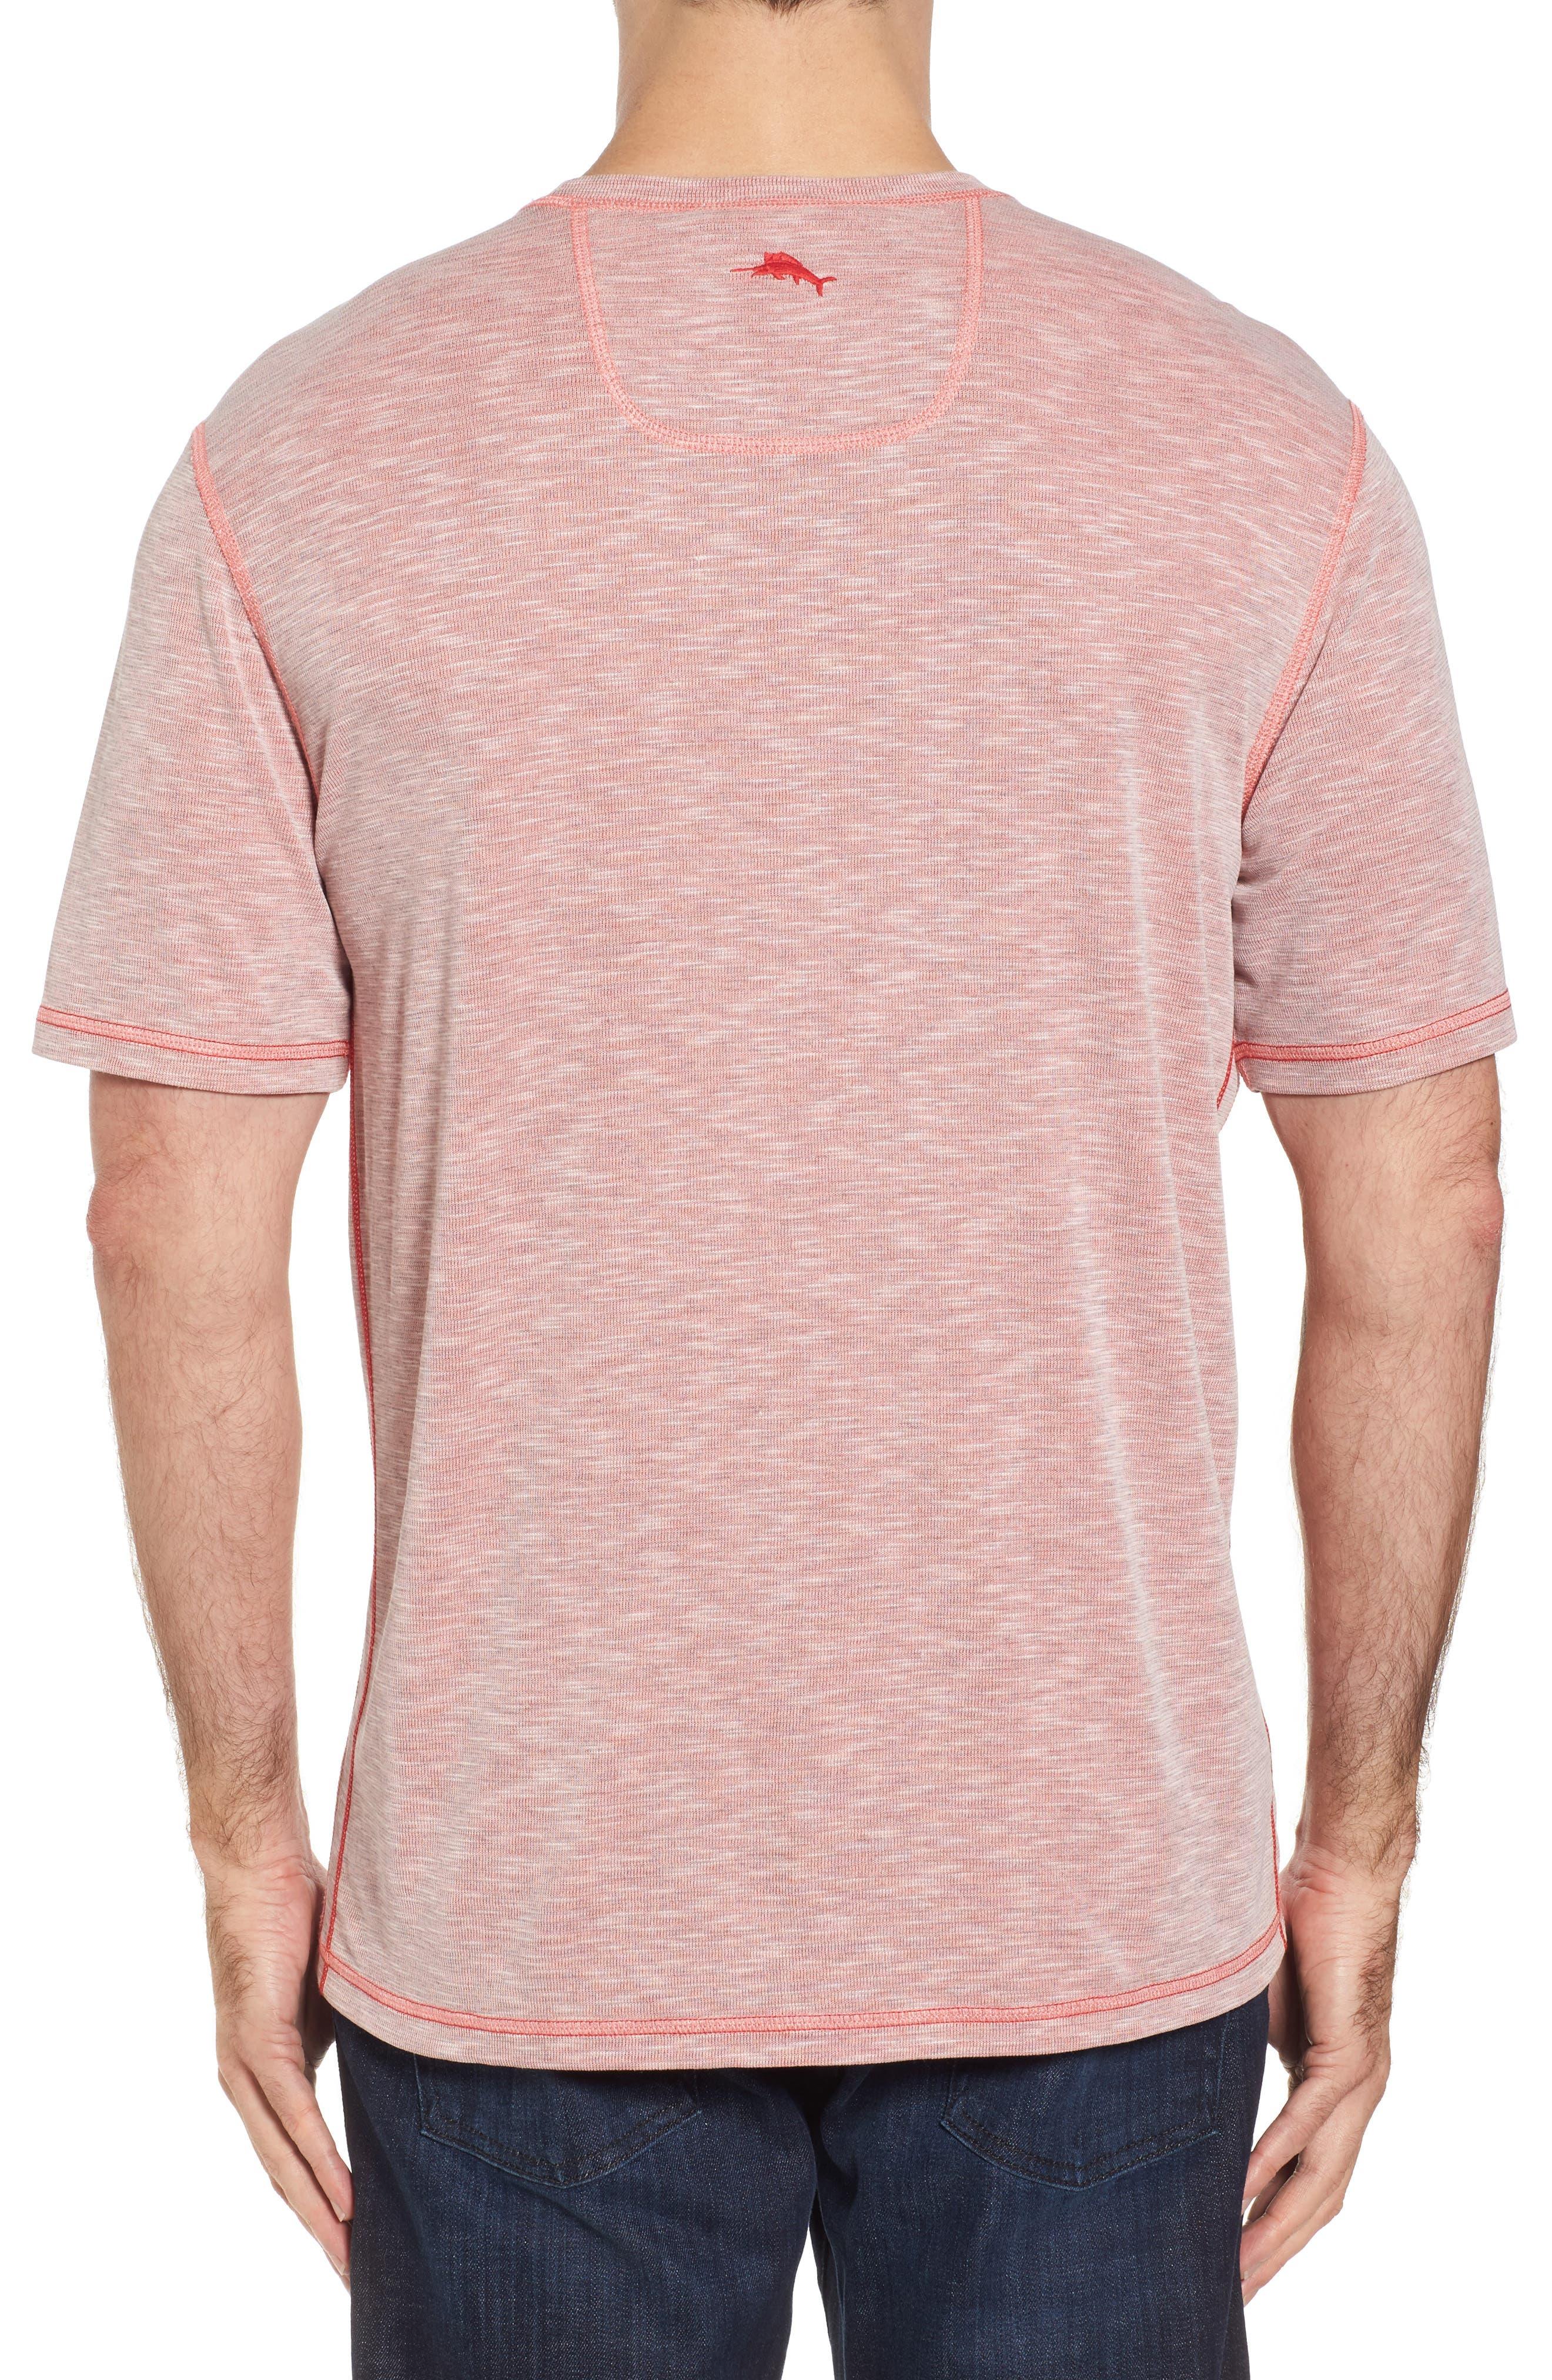 Flip Tide T-Shirt,                             Alternate thumbnail 24, color,